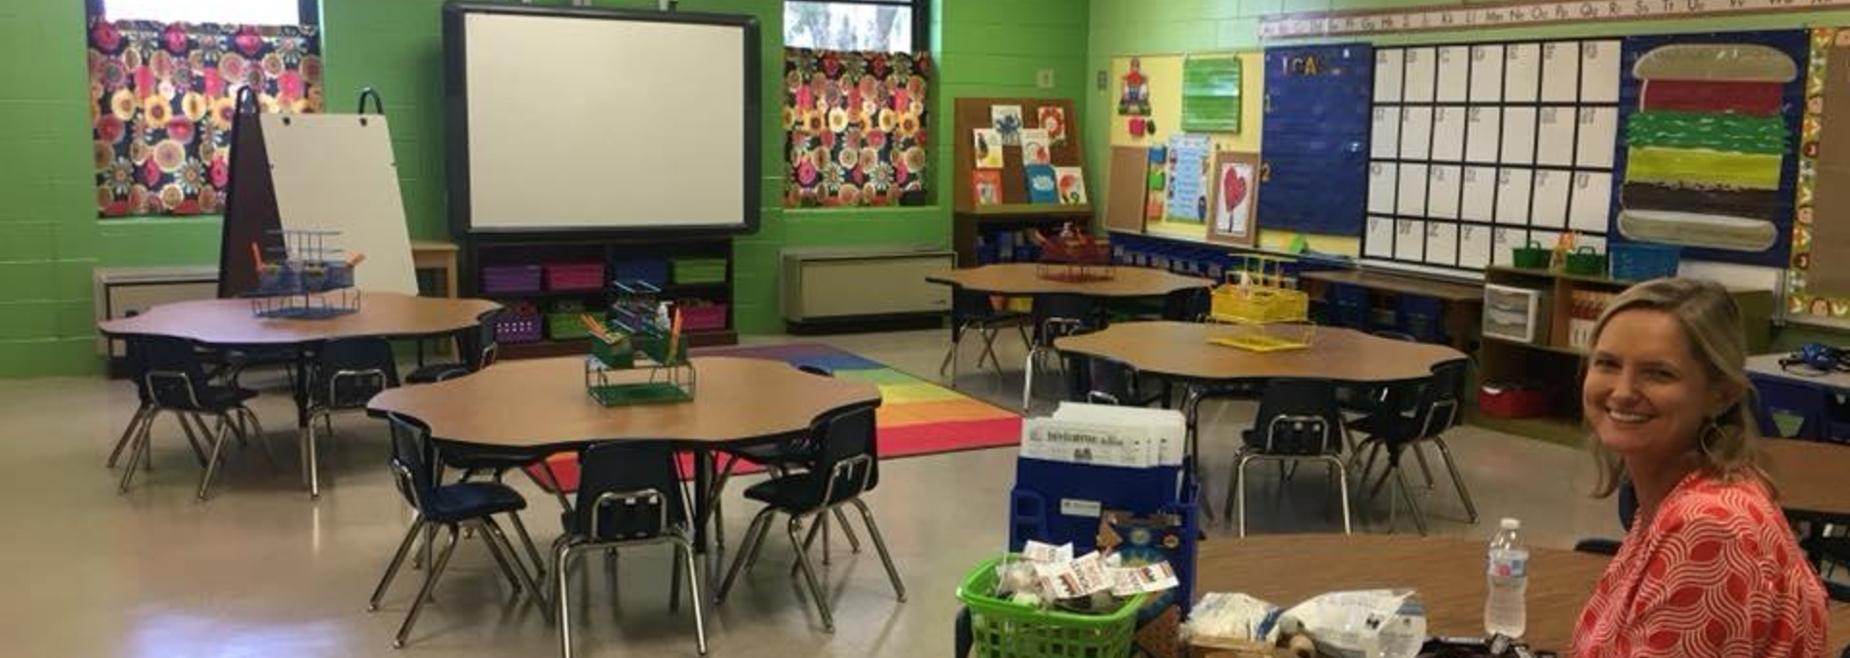 Mrs. McKenzie's 1st grade classroom